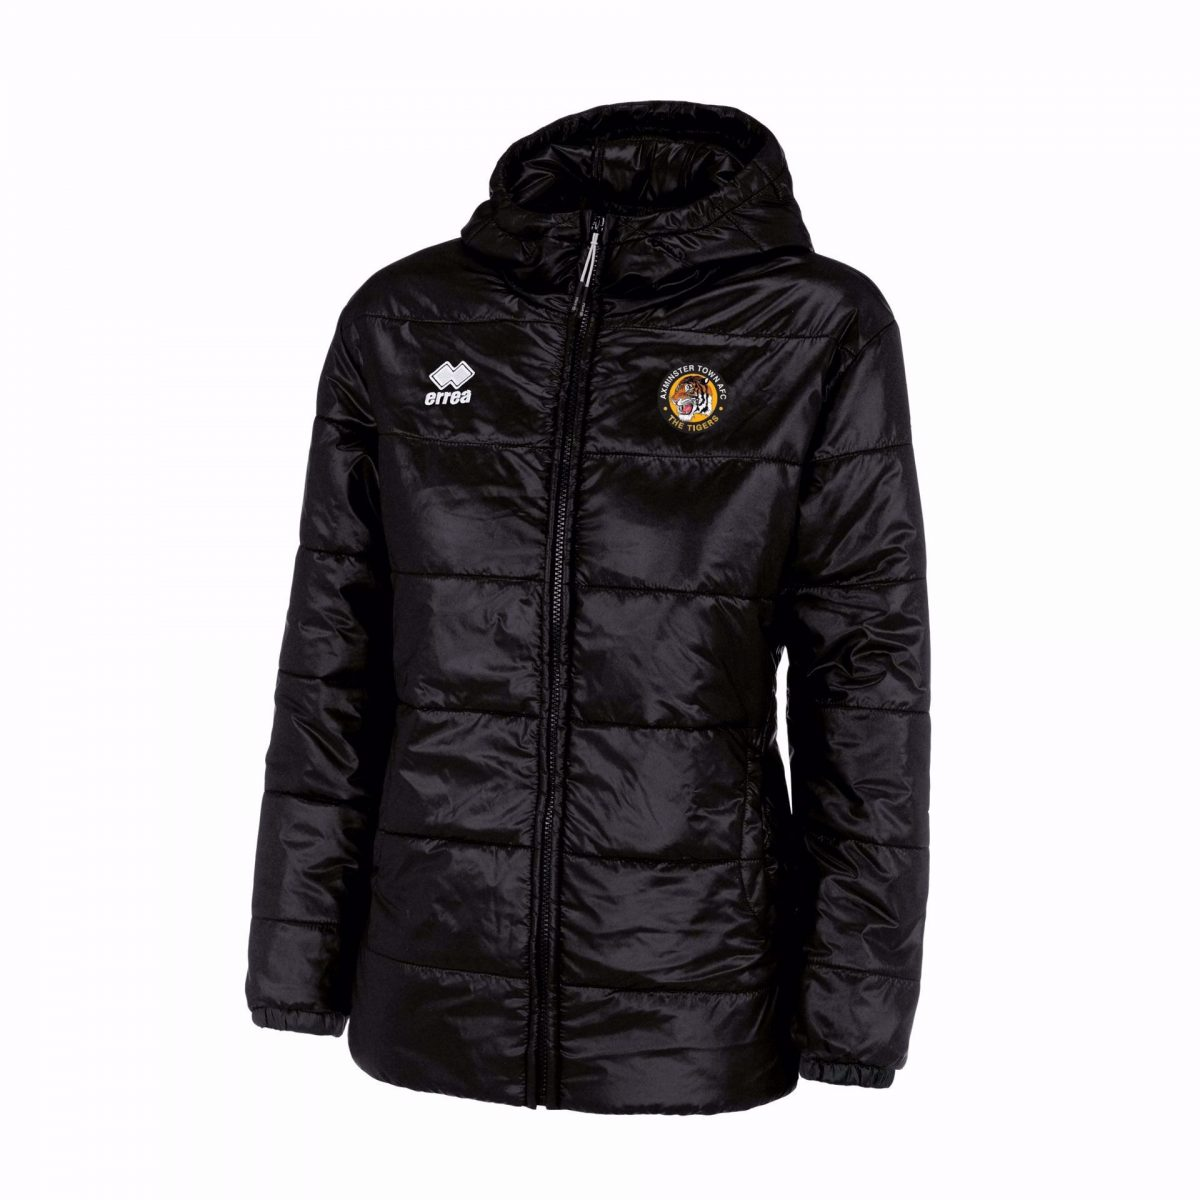 Axminster Town AFC Errea FEMALE  MIAGE  Jacket FJOCOZ